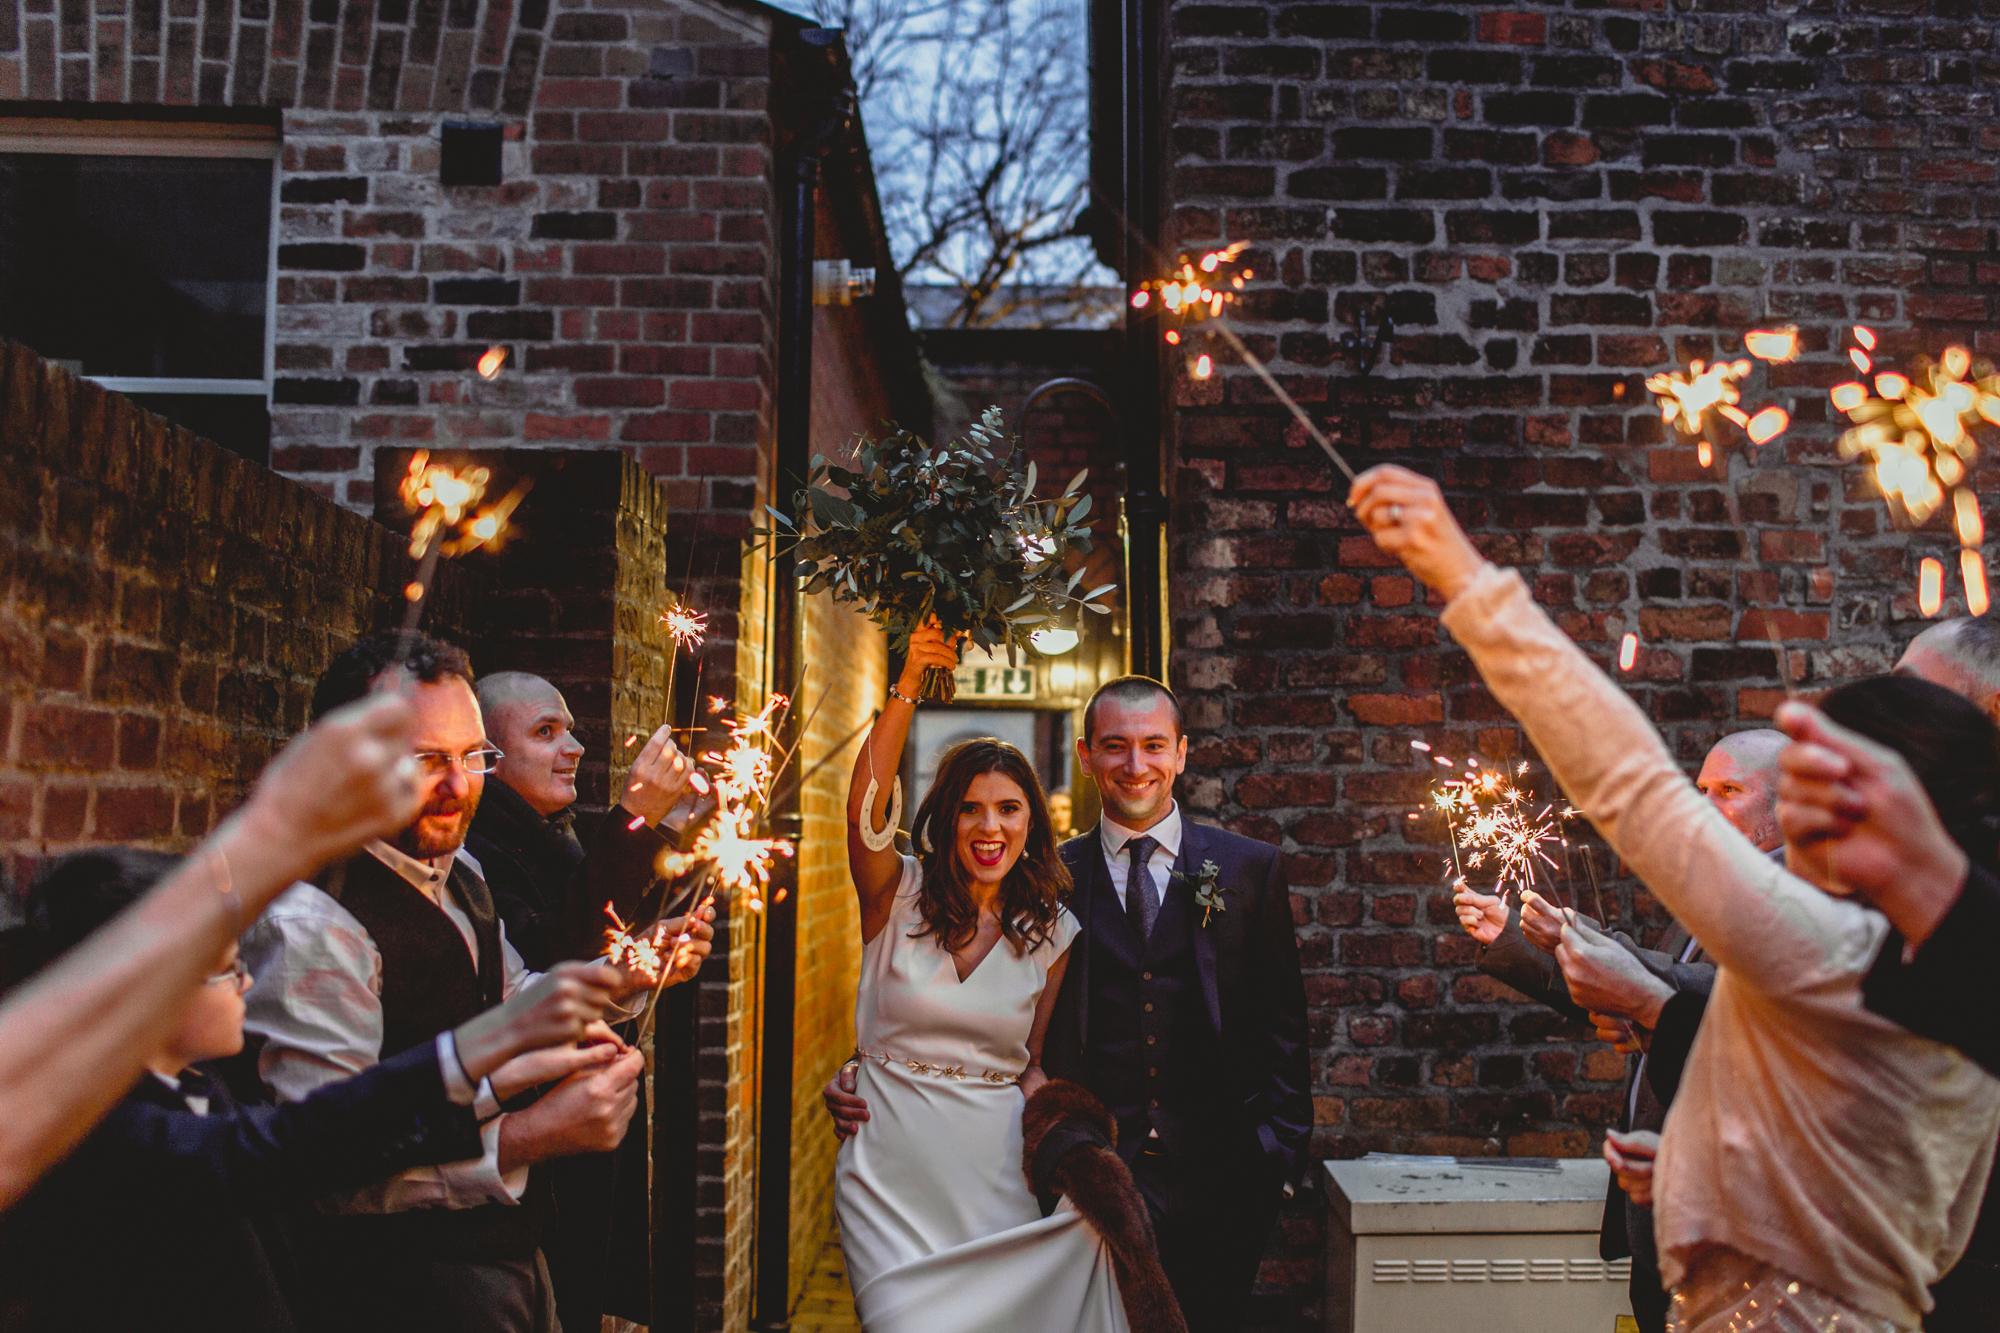 City_Centre_northern_ireland_wedding_inspire_weddings_23.jpg